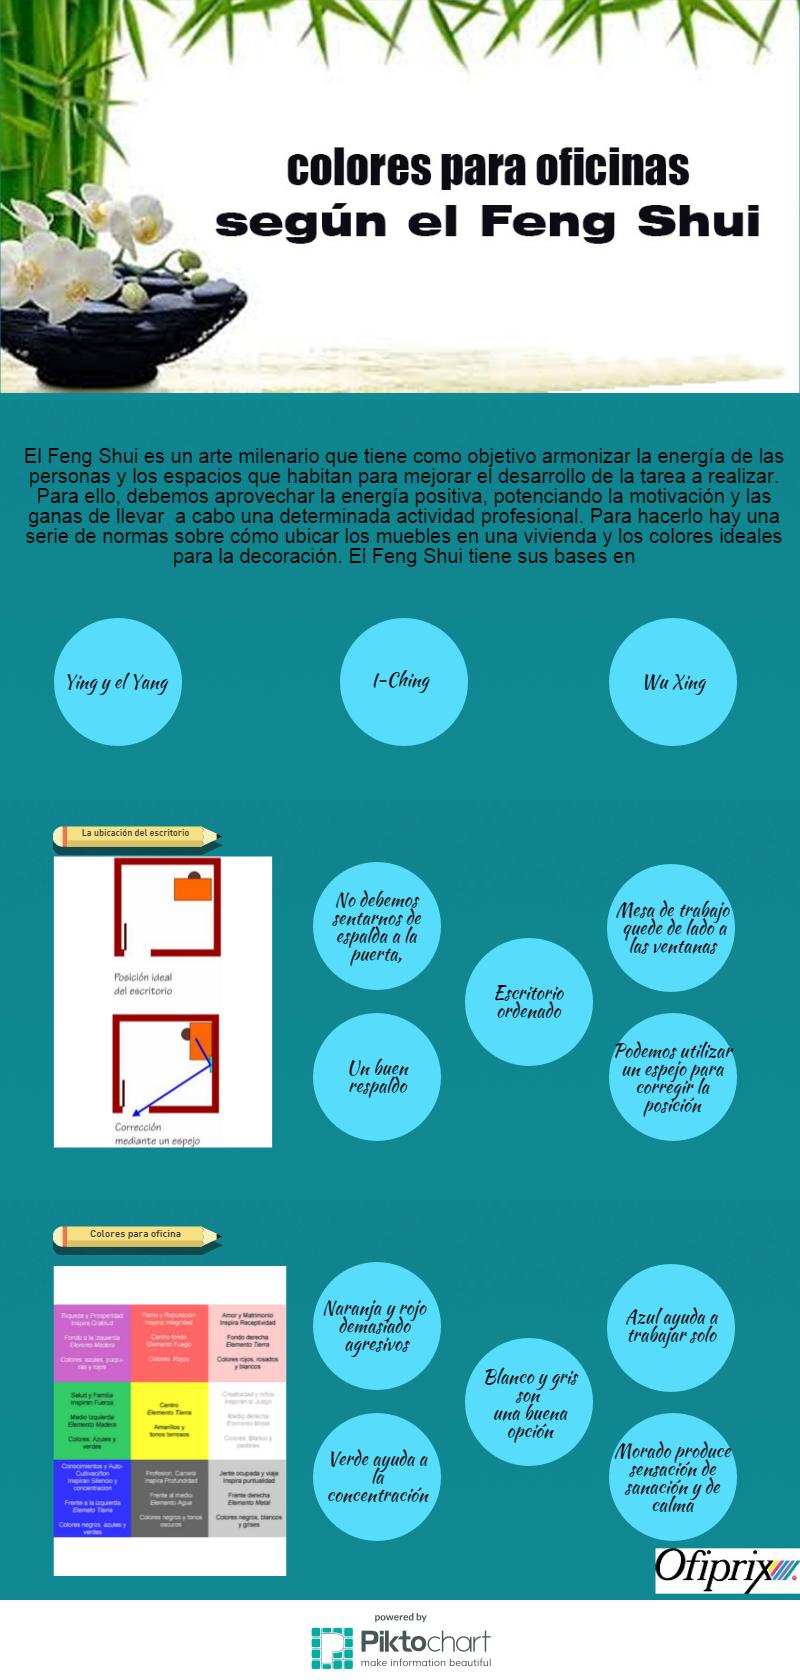 colores para oficinas segn feng shui infografia ofiprix